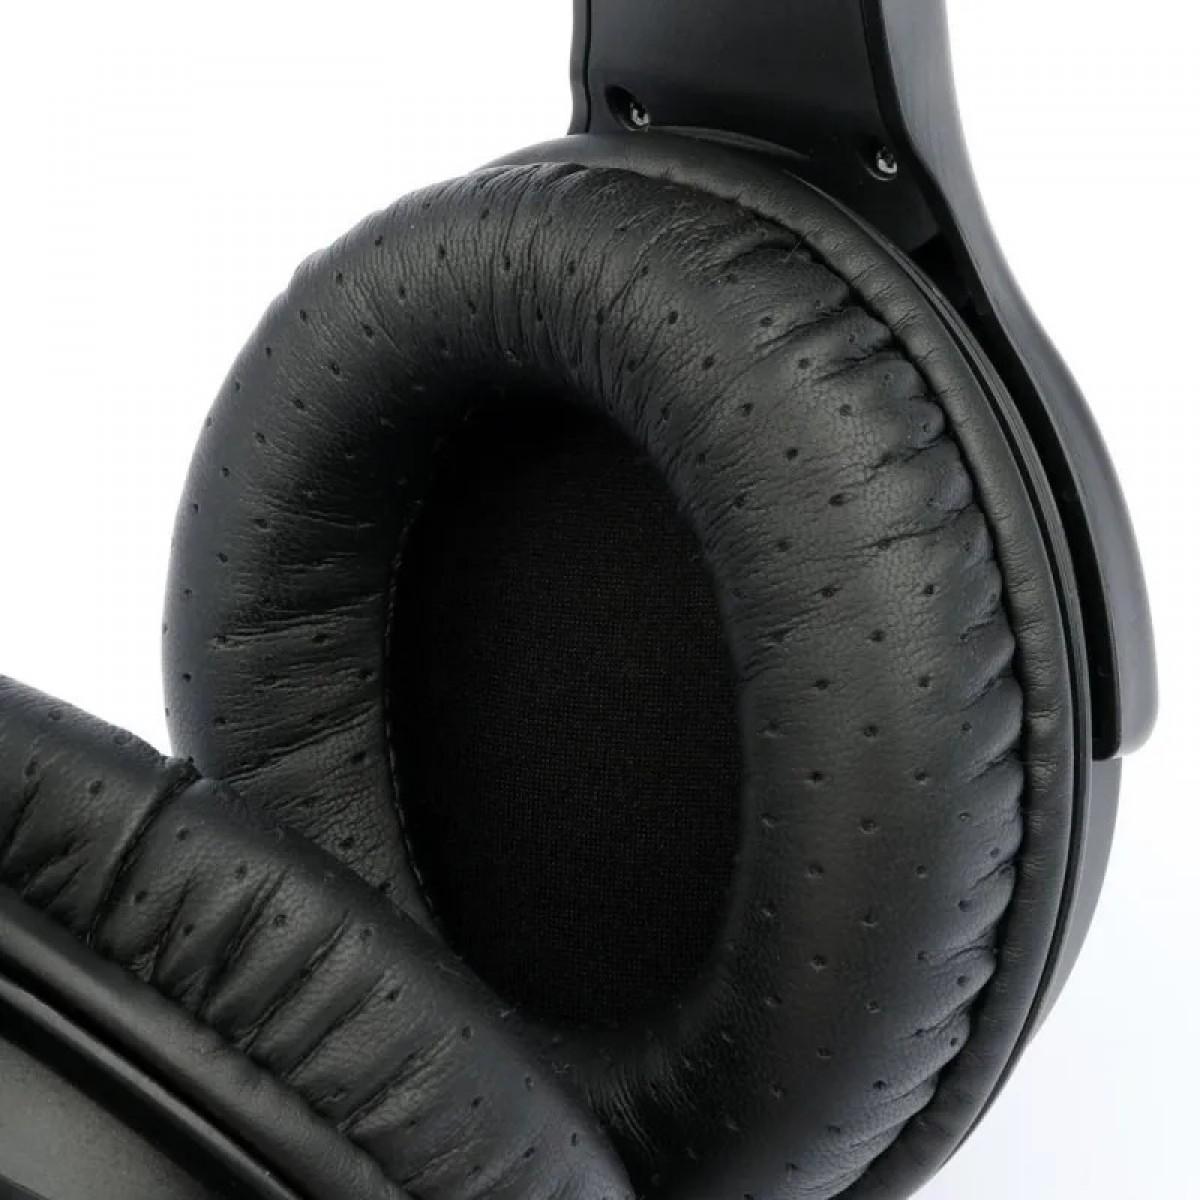 Headset Gamer ReDragon, Pandora, RGB, USB, Microfone Destacável, H350RGB